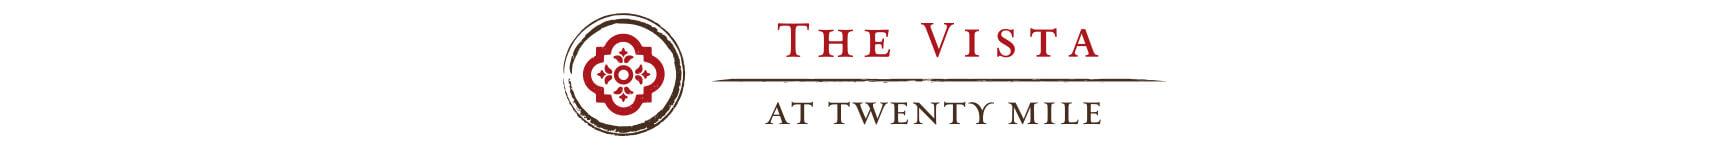 The-Vista-banner.jpg